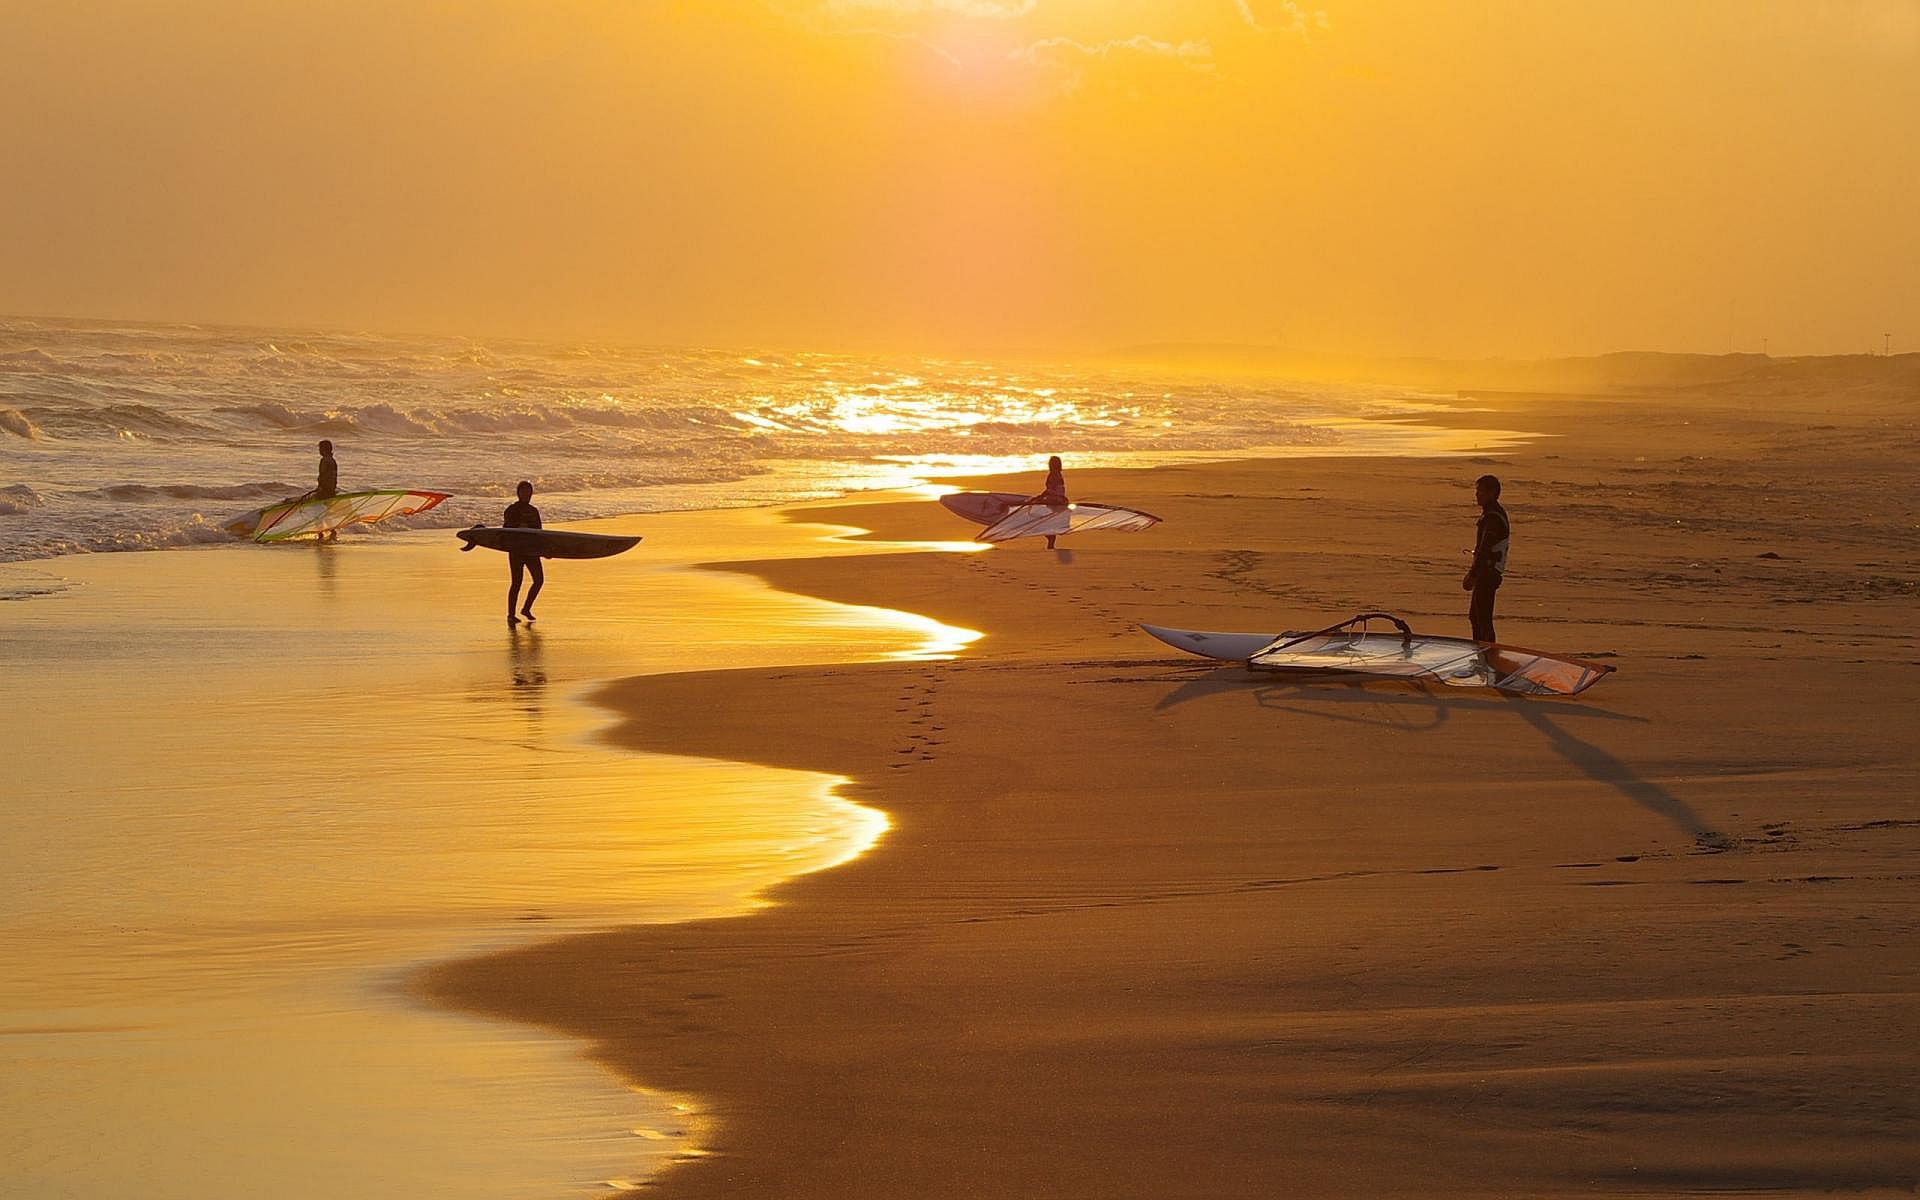 Cute Live Wallpaper Download Peru Mancora Surf Beach Hd Desktop Wallpapers 4k Hd